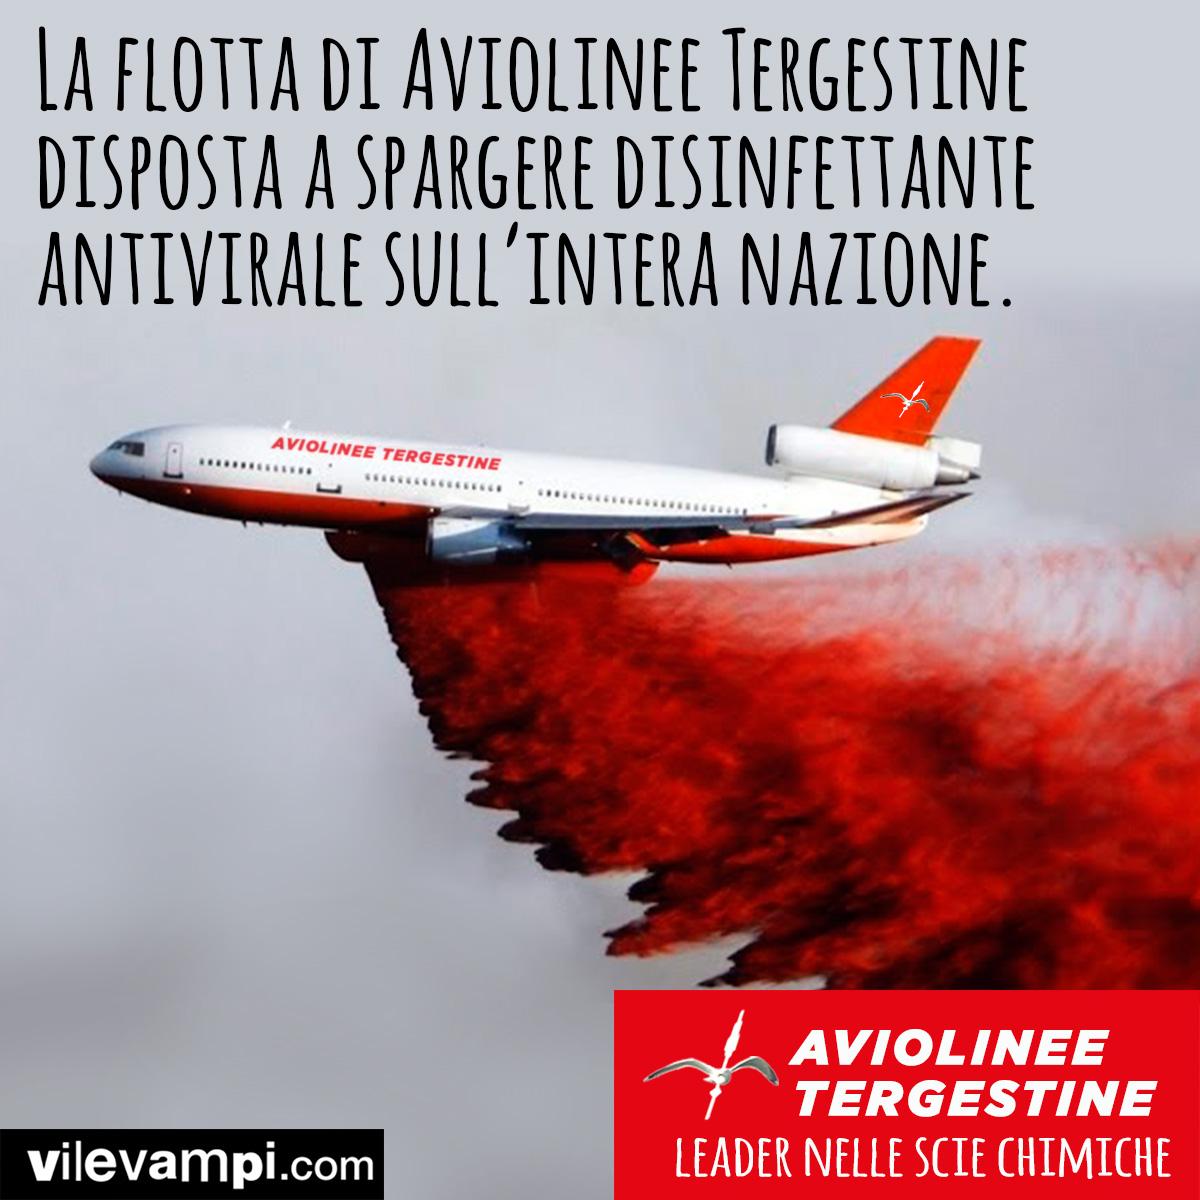 2020_Aviolineee-TS_disinfest